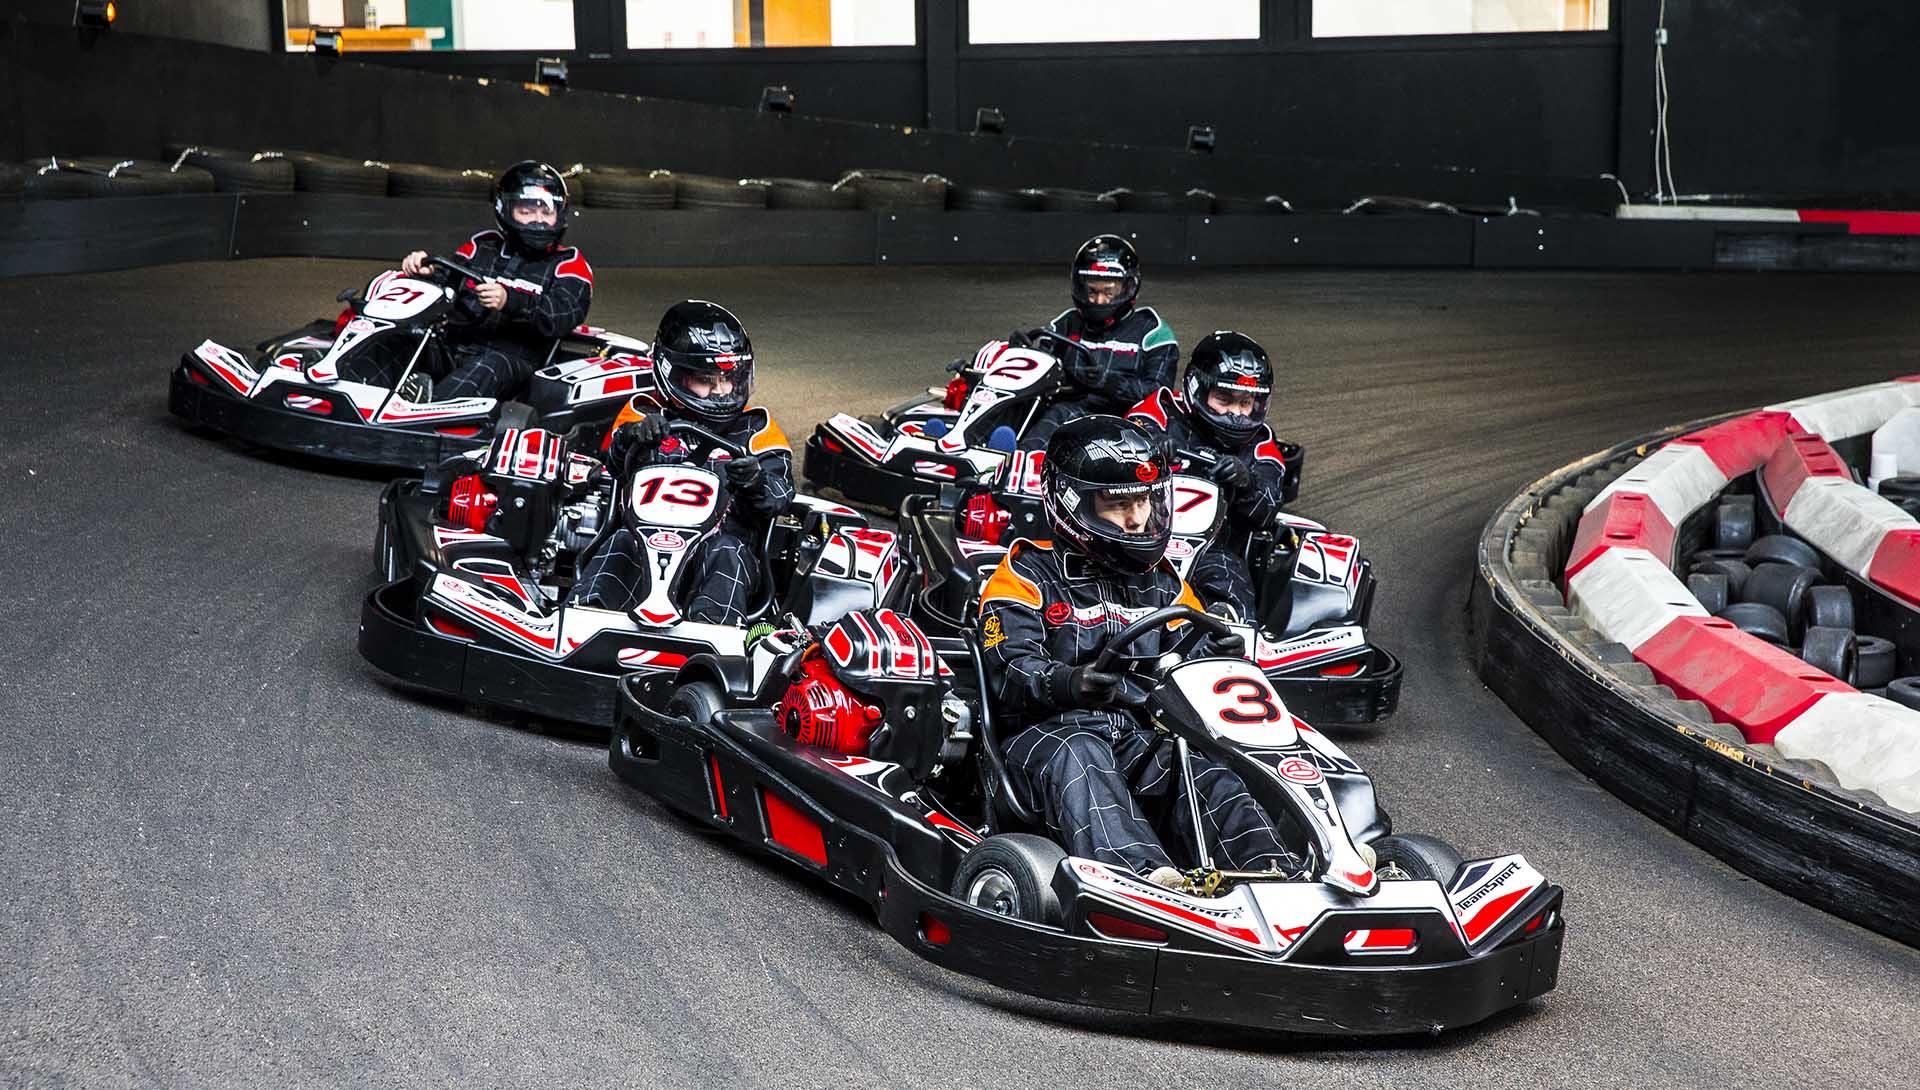 Go Karting 50 Lap Race